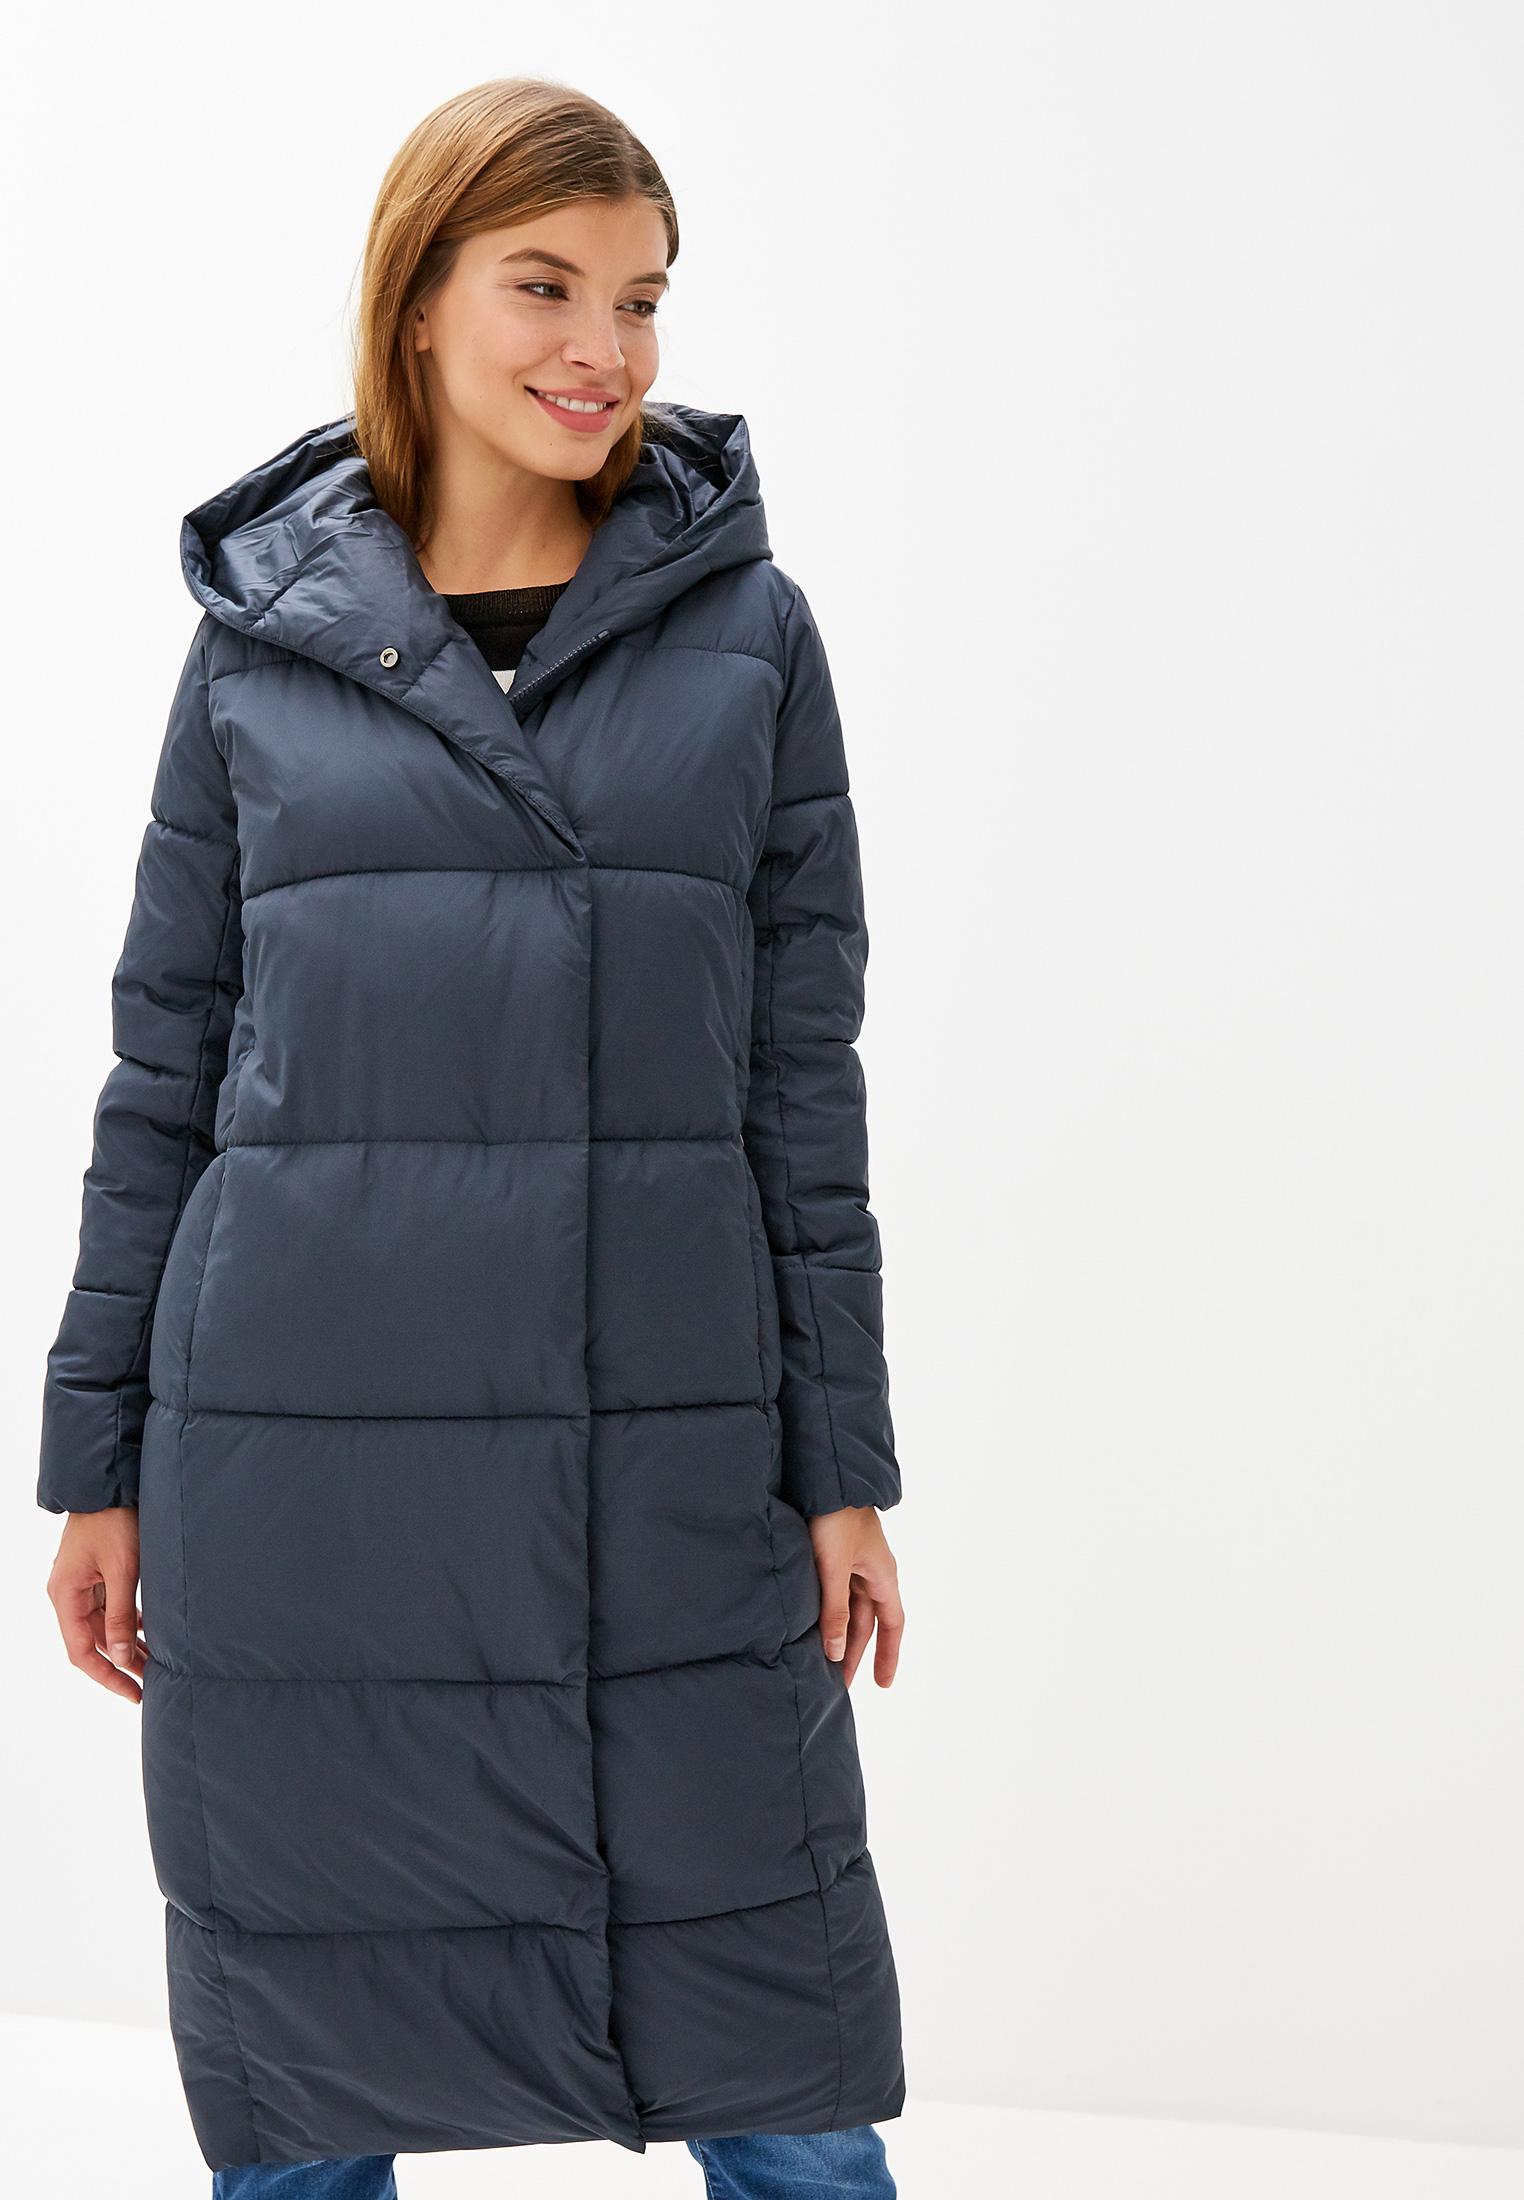 Куртка утепленная, Savage, цвет: синий. Артикул: SA004EWGESF3. Одежда / Верхняя одежда / Пуховики и зимние куртки